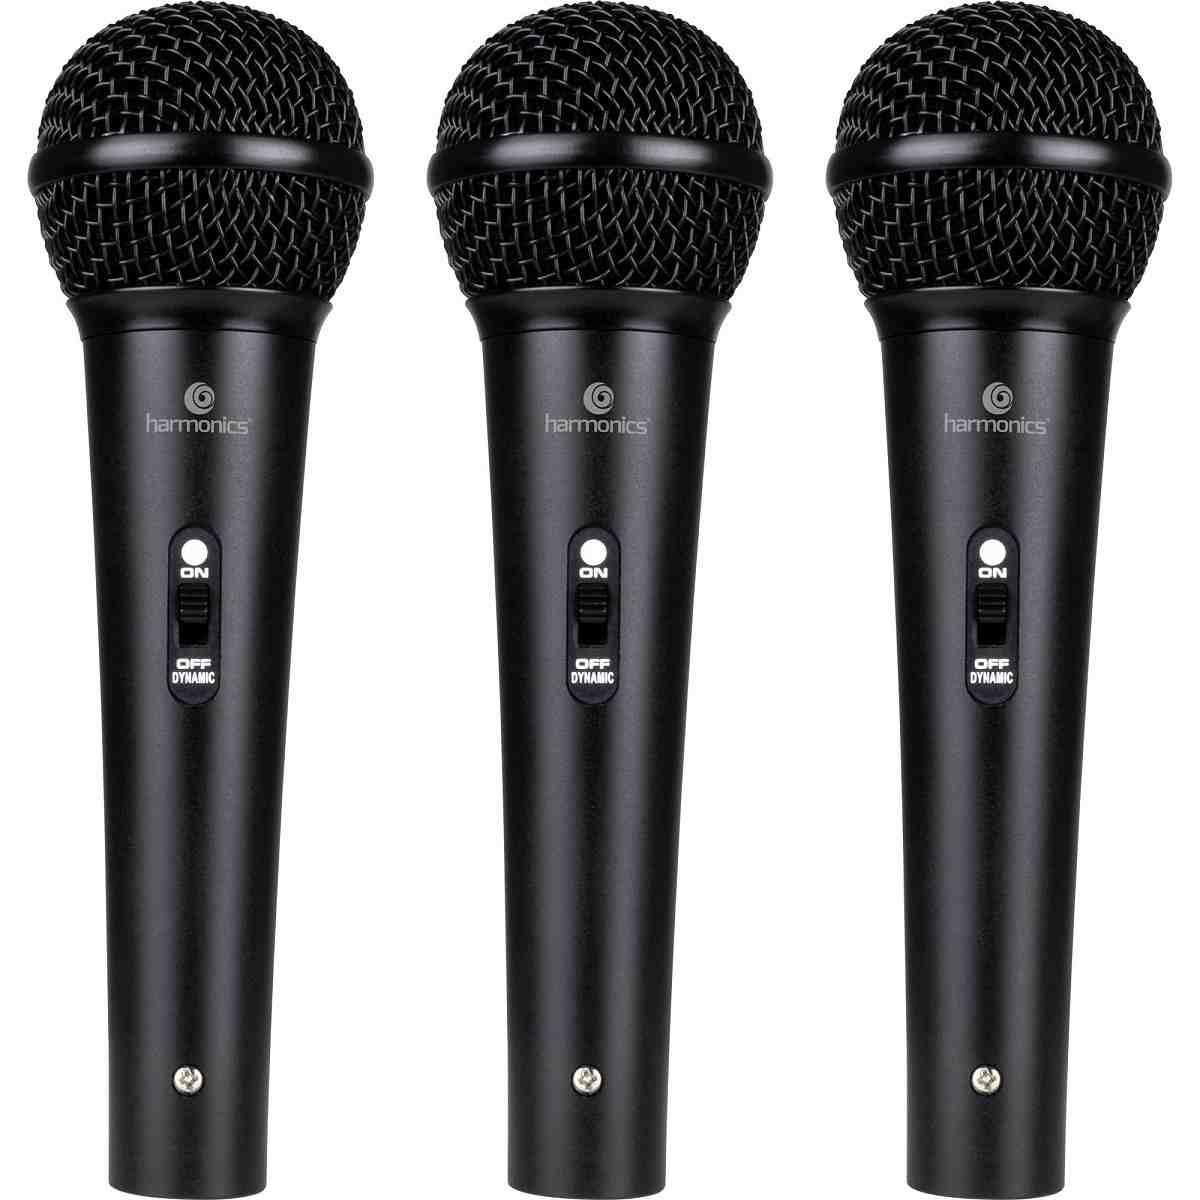 Kit 3 Microfones Dinâmicos Cardióide MDU201 Harmonics Preto + Maleta